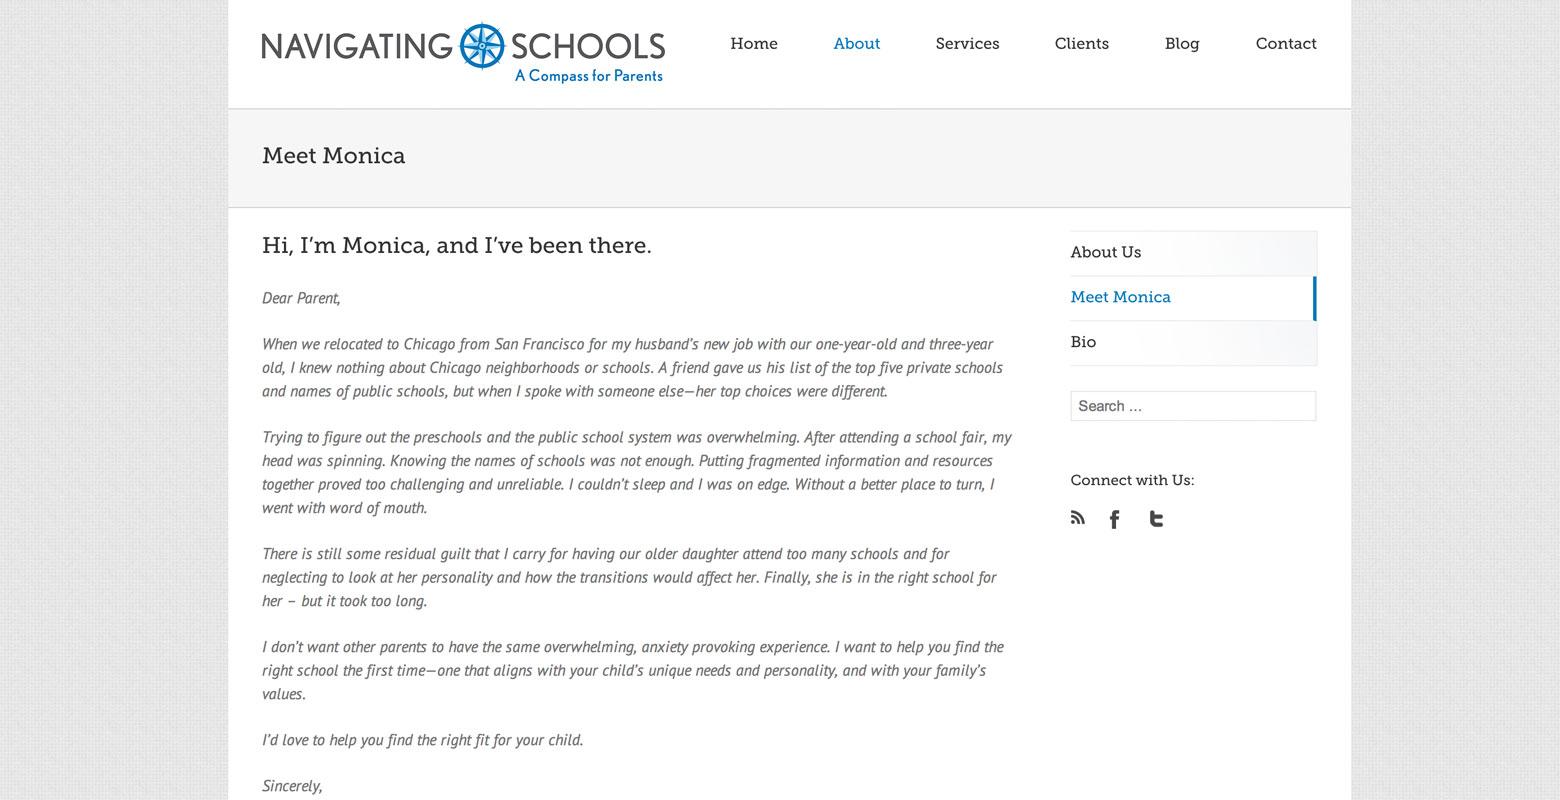 Navigating Schools